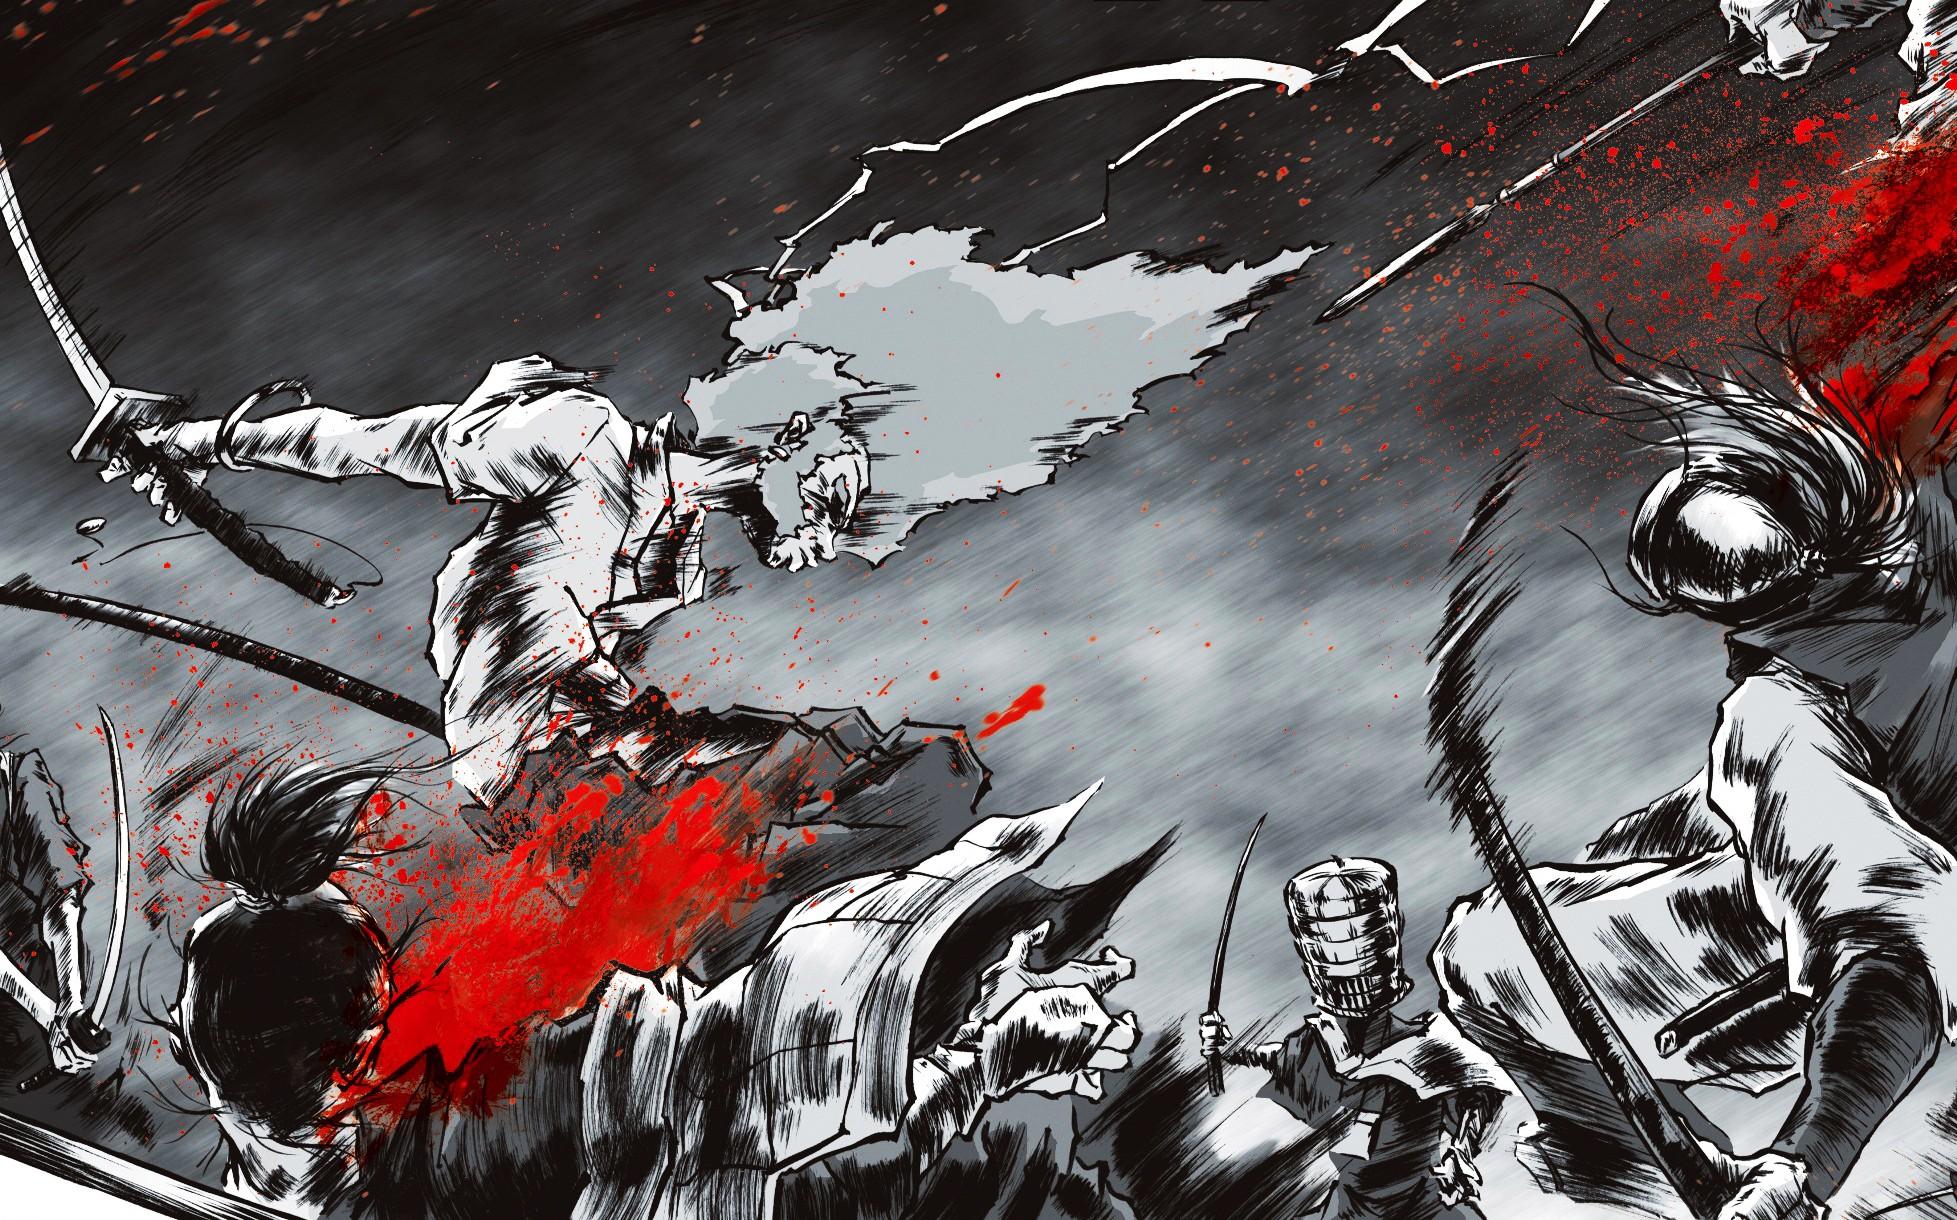 Afro Samurai: Resurrection(2009)